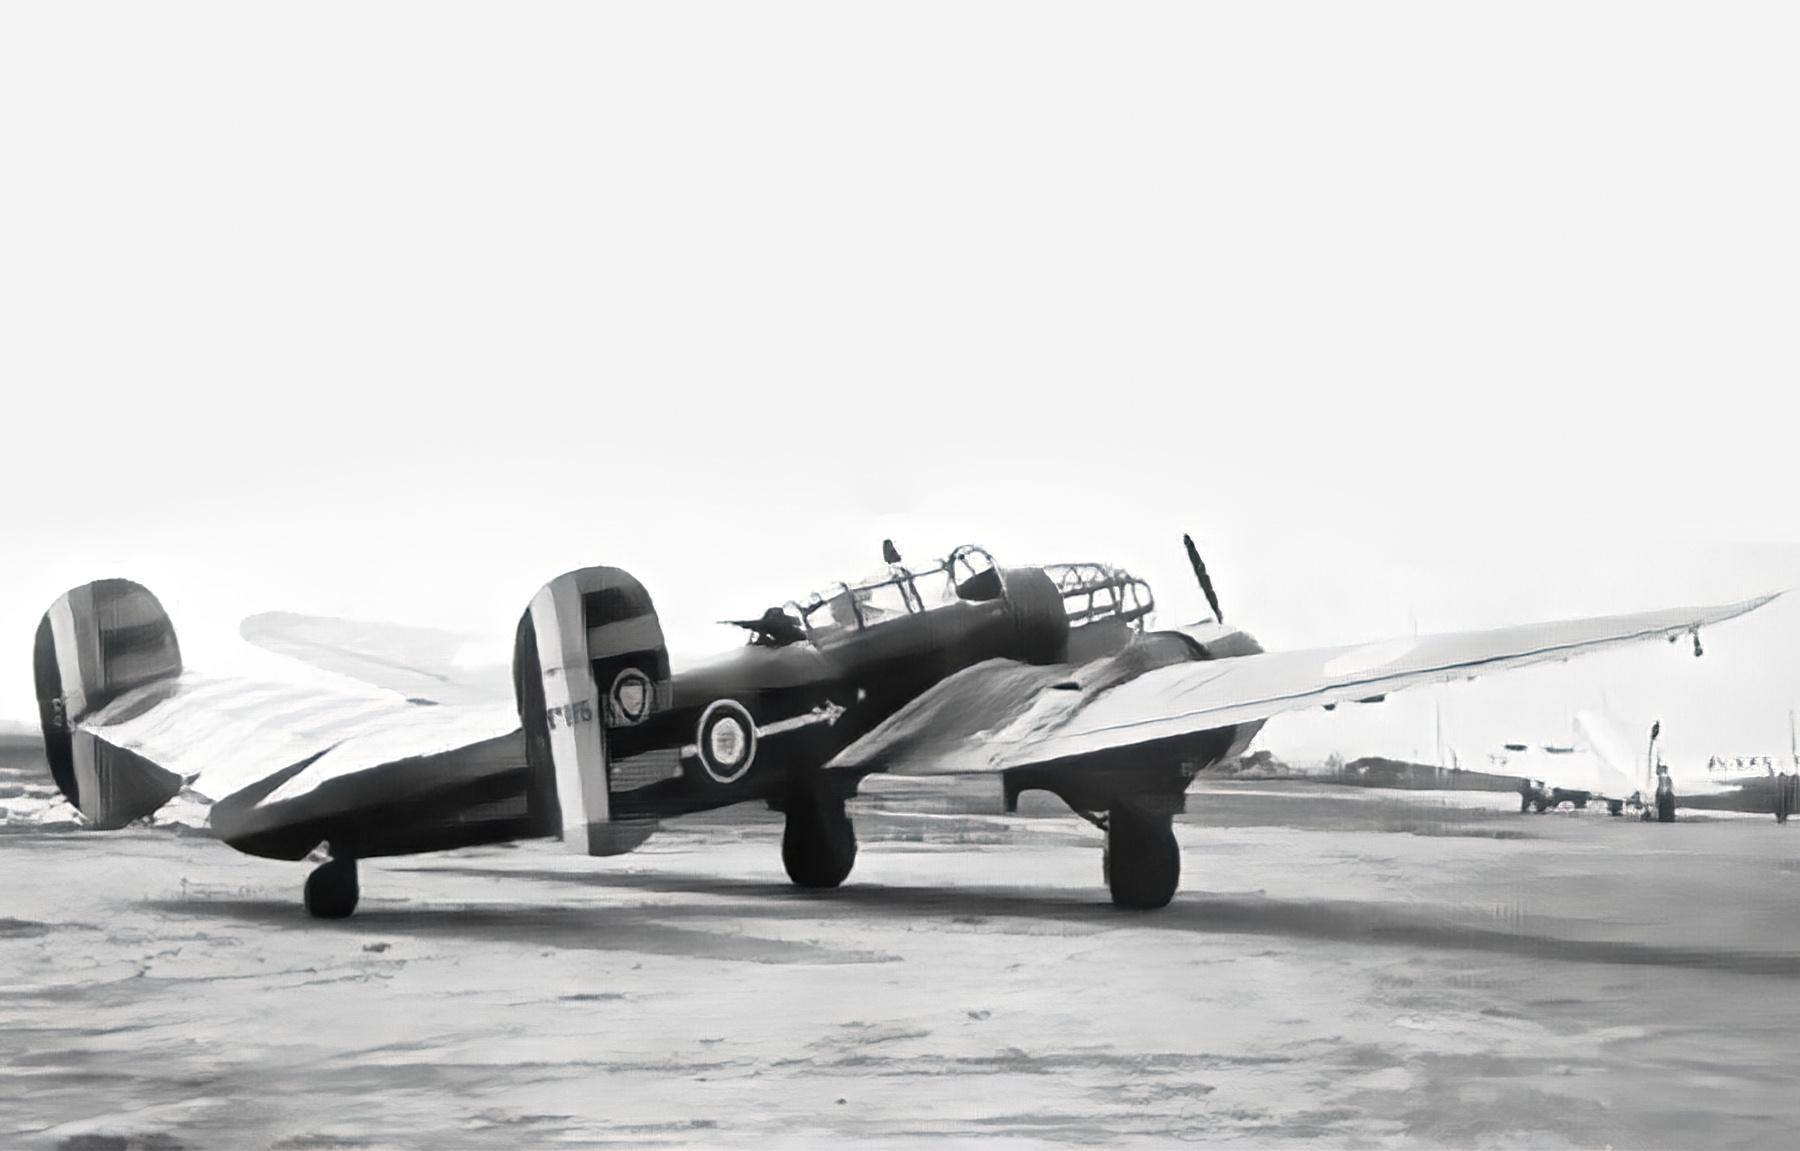 Vichy French Bloch MB 174 sn115 awaits deployment North Africa ebay 01